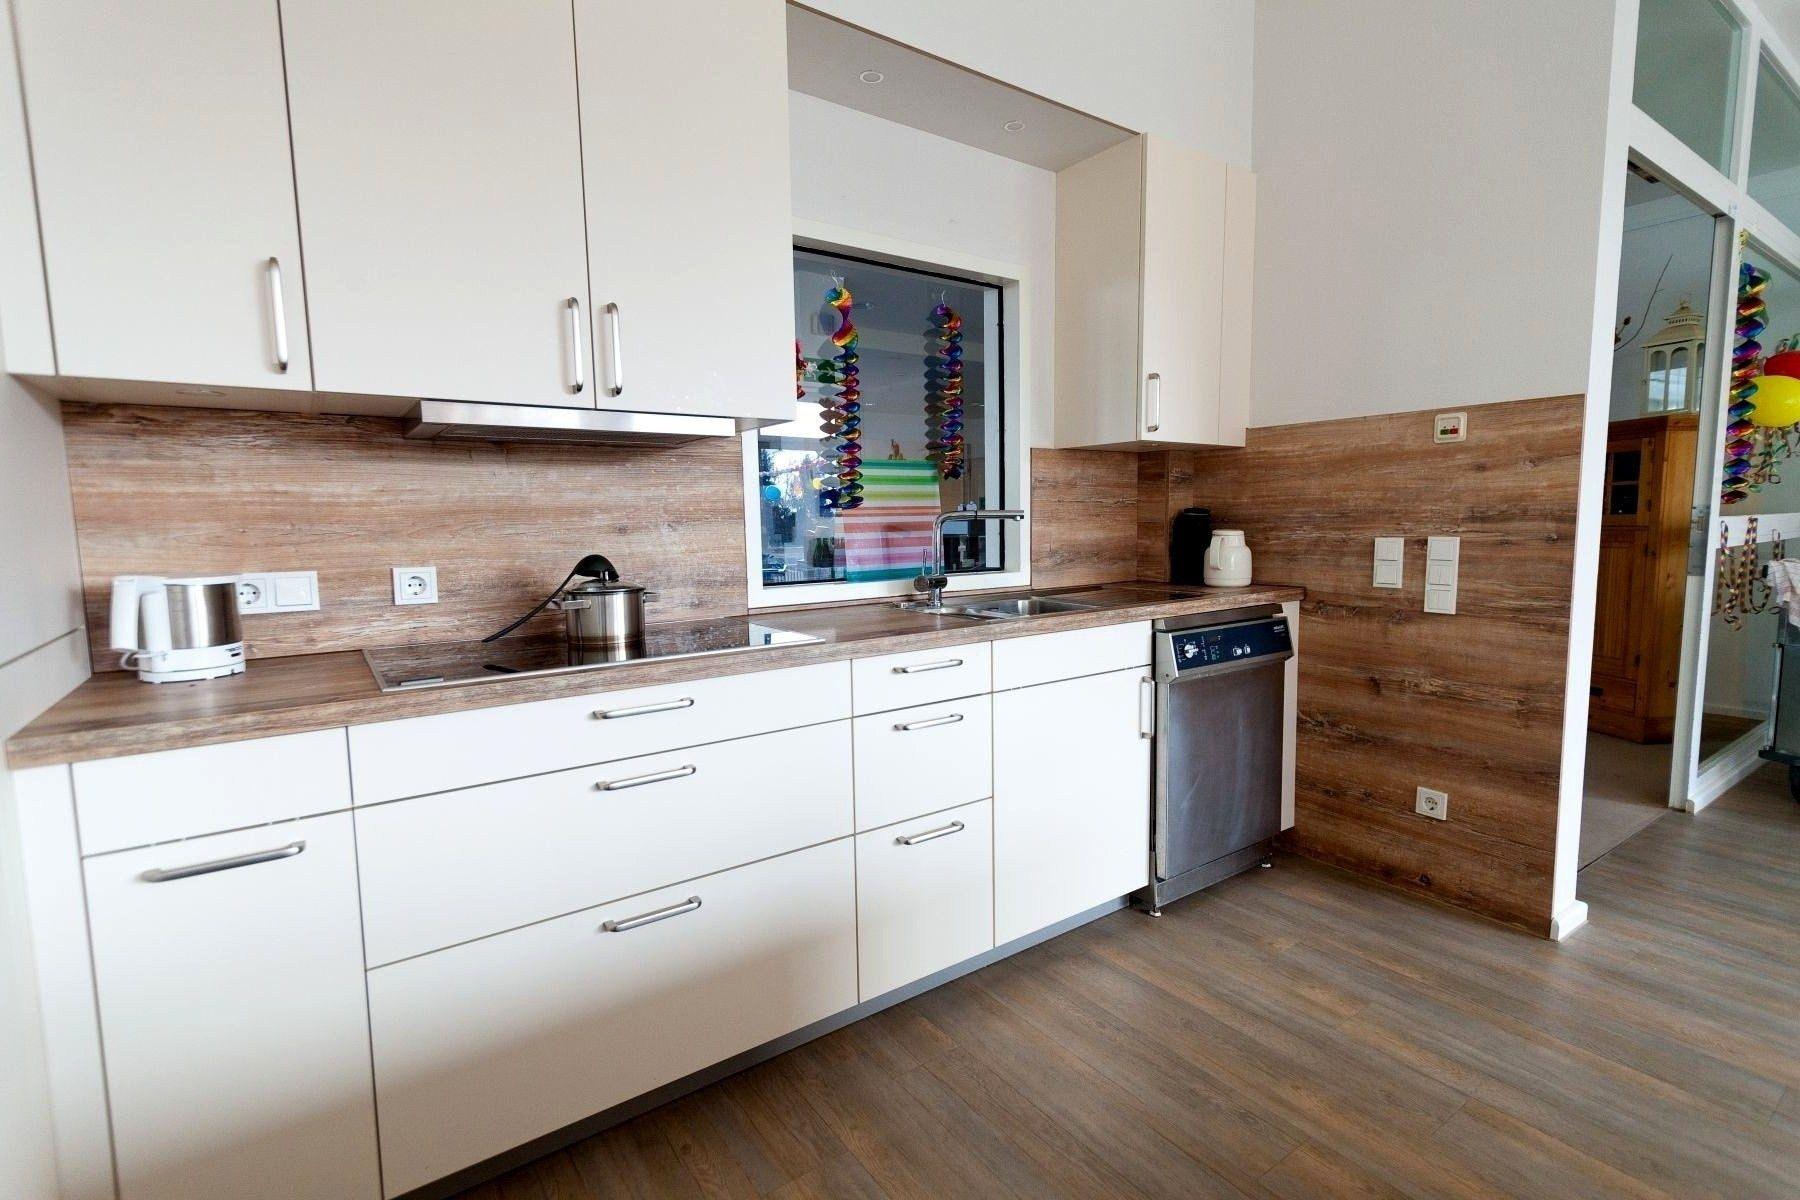 23 neu arbeitsplatte küche weiß holz | apartment